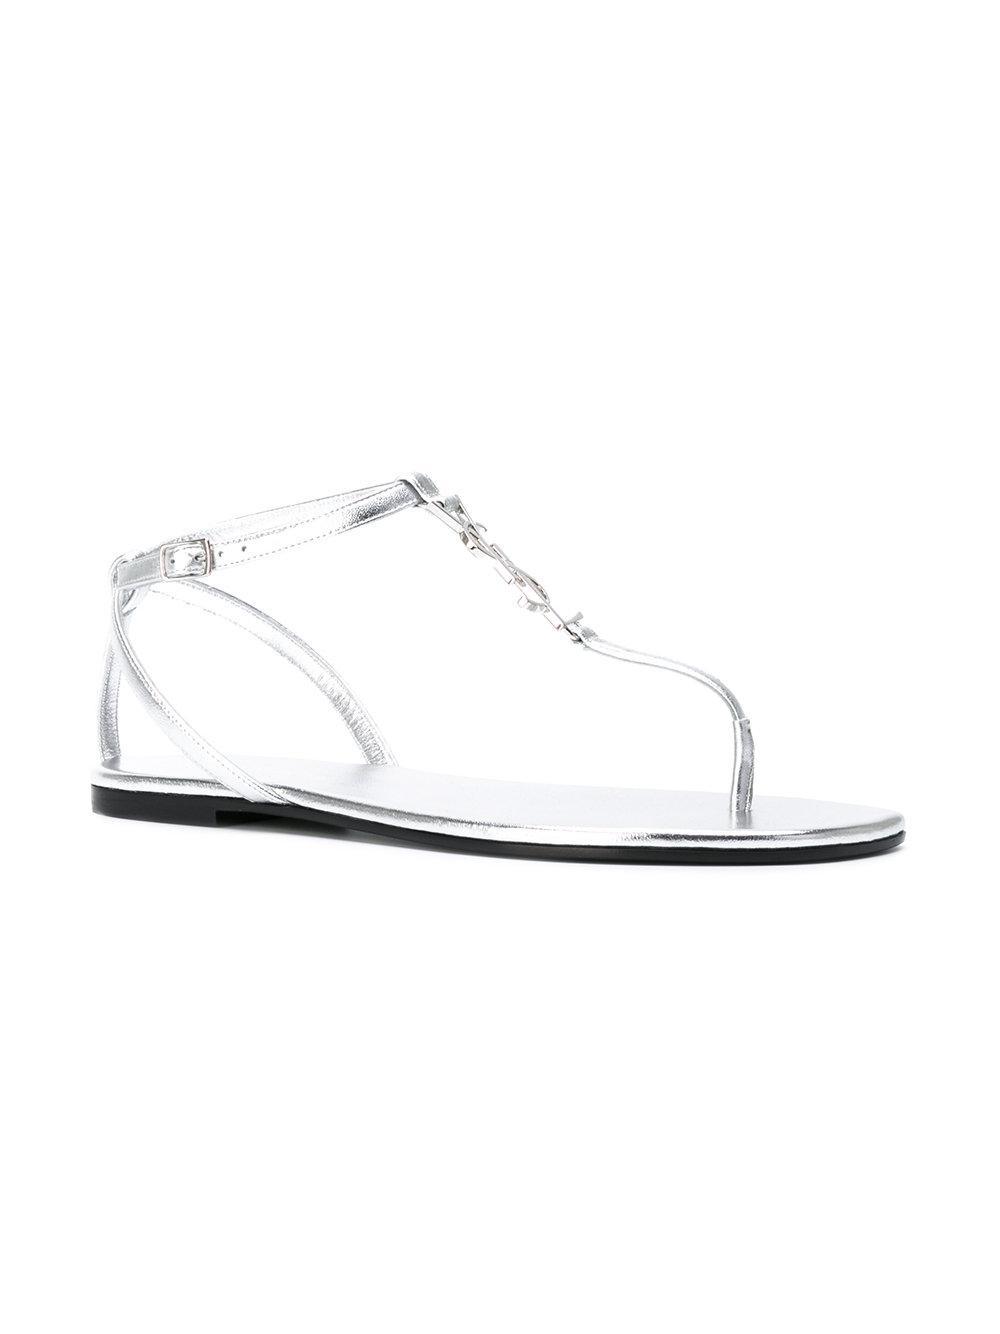 56a0dc6ce0c1 Lyst - Saint Laurent Nu Pieds 05 Ysl Sandals in Metallic